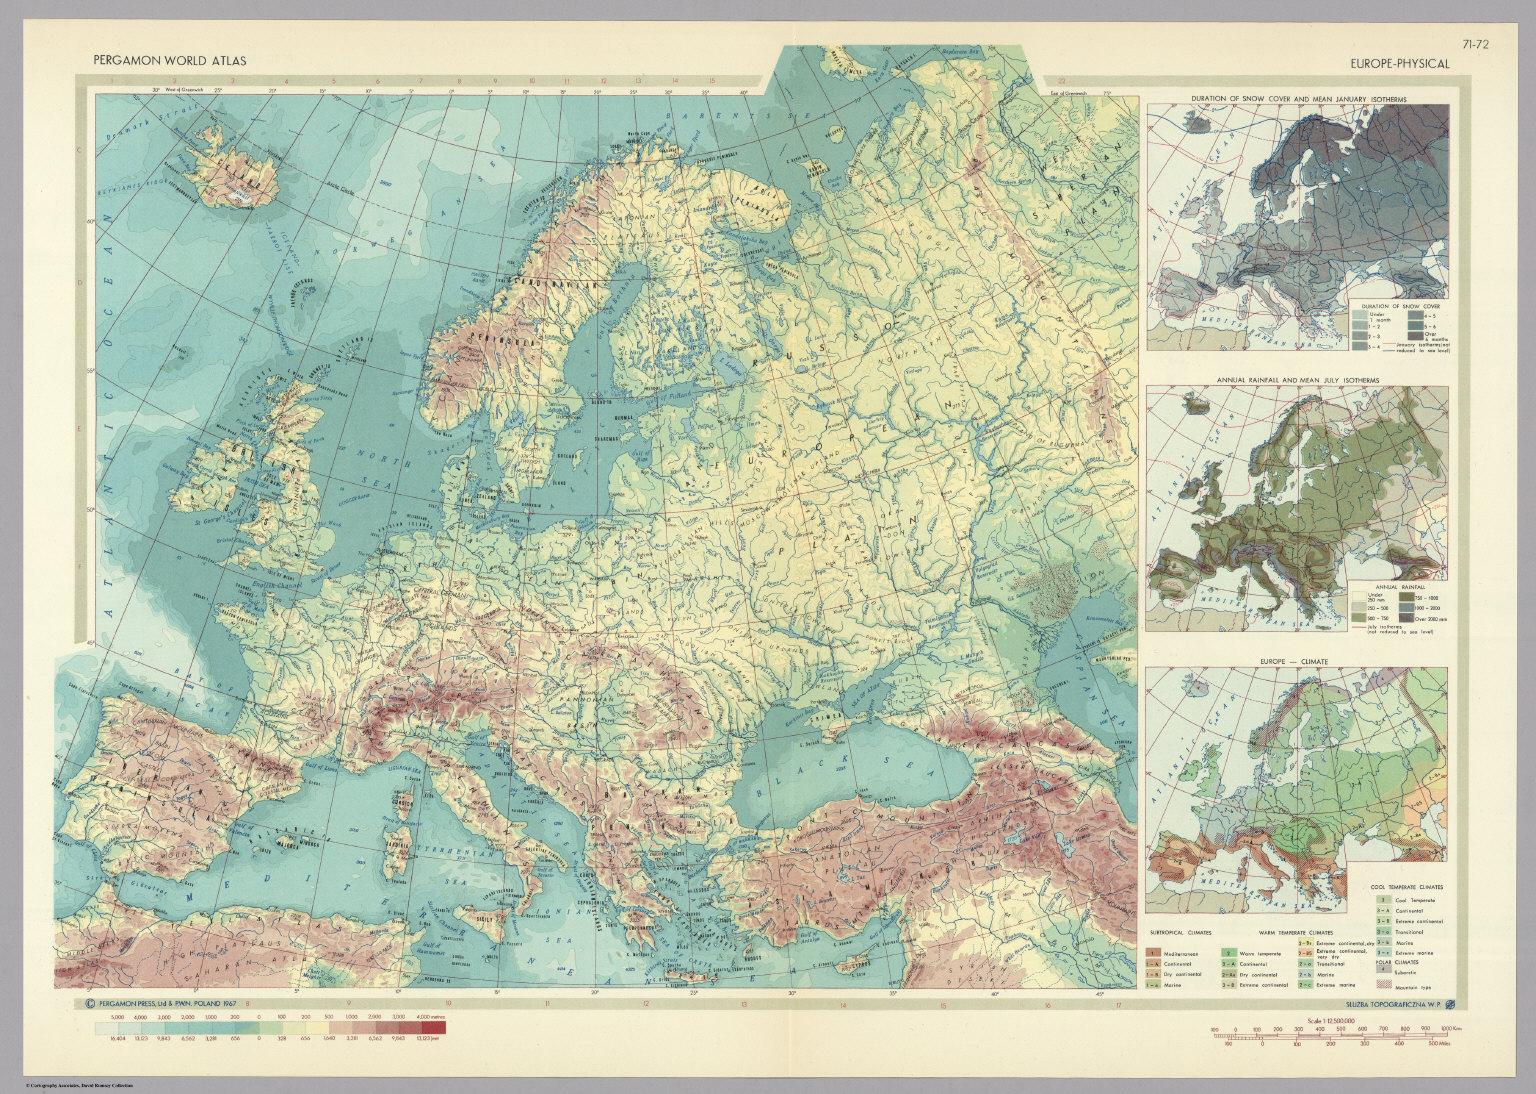 Europe physical pergamon world atlas david rumsey historical pergamon world atlas david rumsey historical map collection gumiabroncs Choice Image